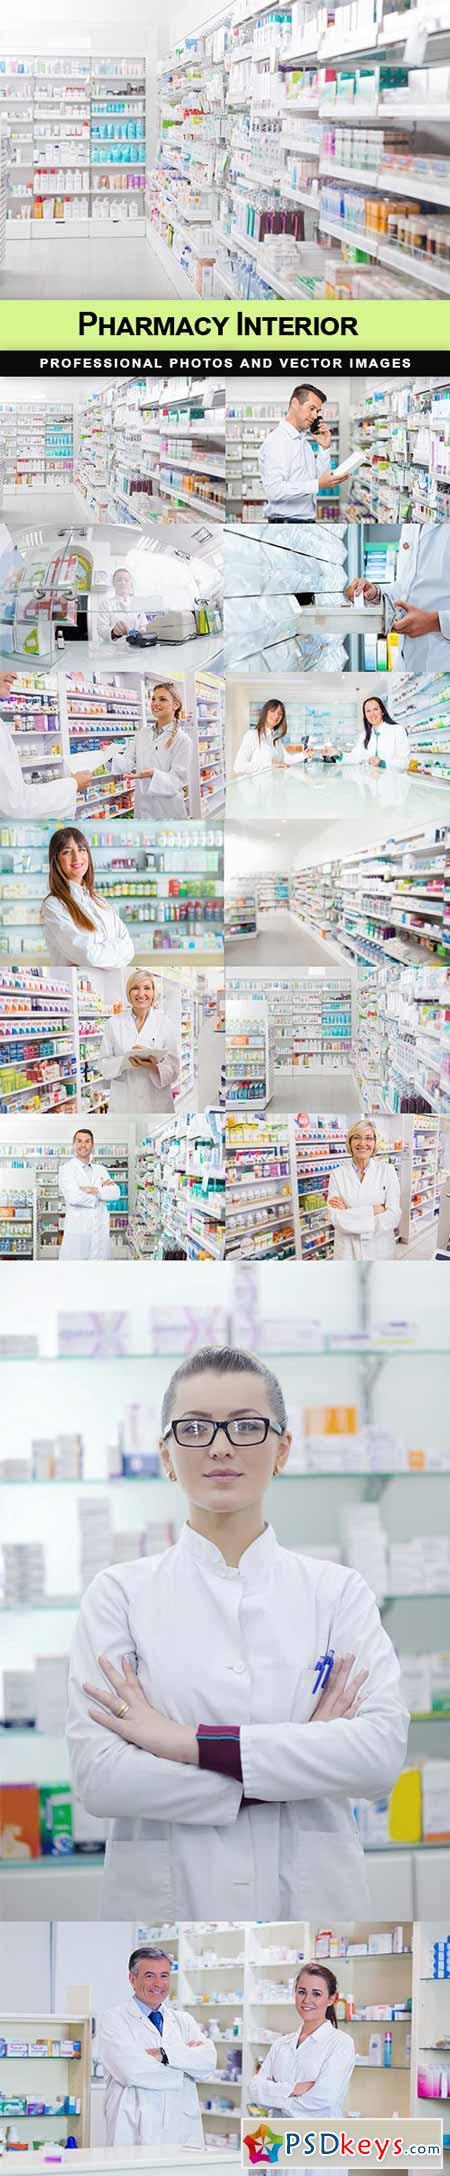 Pharmacy Interior - 14 UHQ JPEG